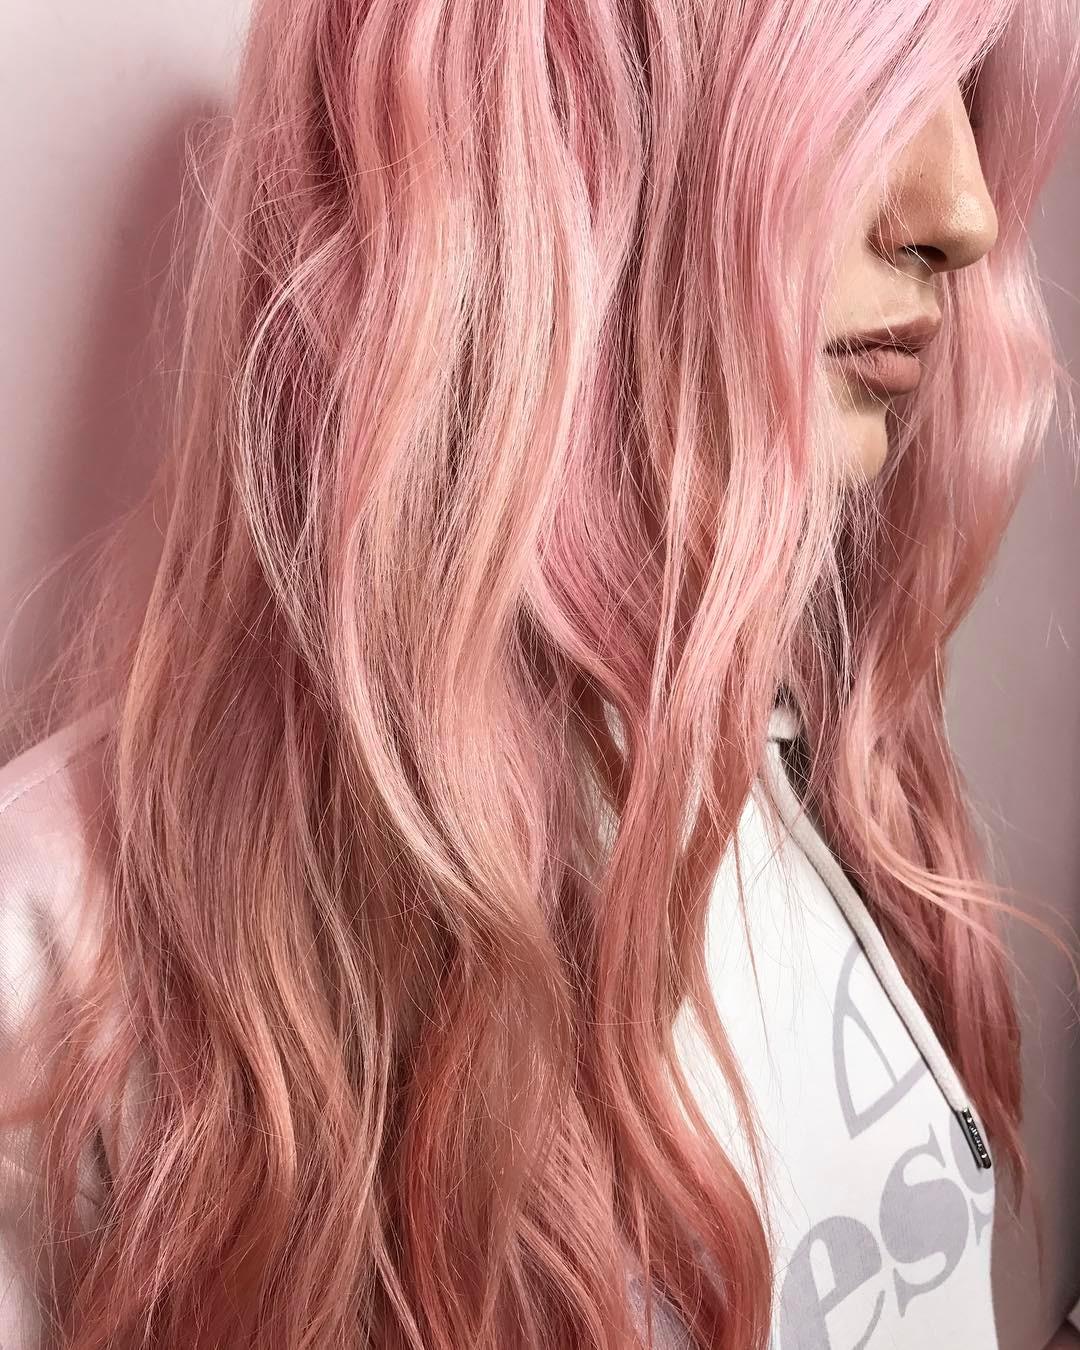 Окрашивание волос 2018 розовое золото